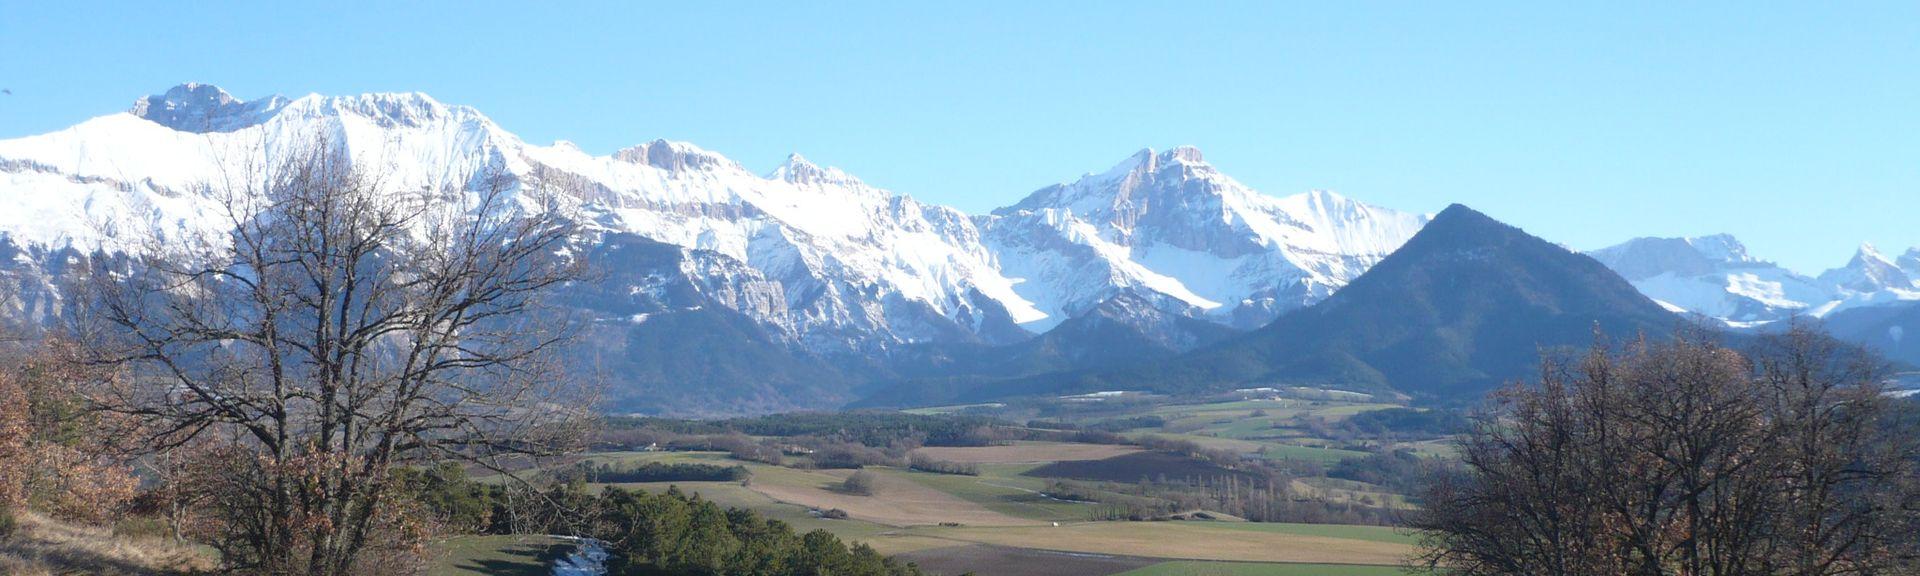 Lalley, Auvergne Rhône-Alpes, Frankrijk